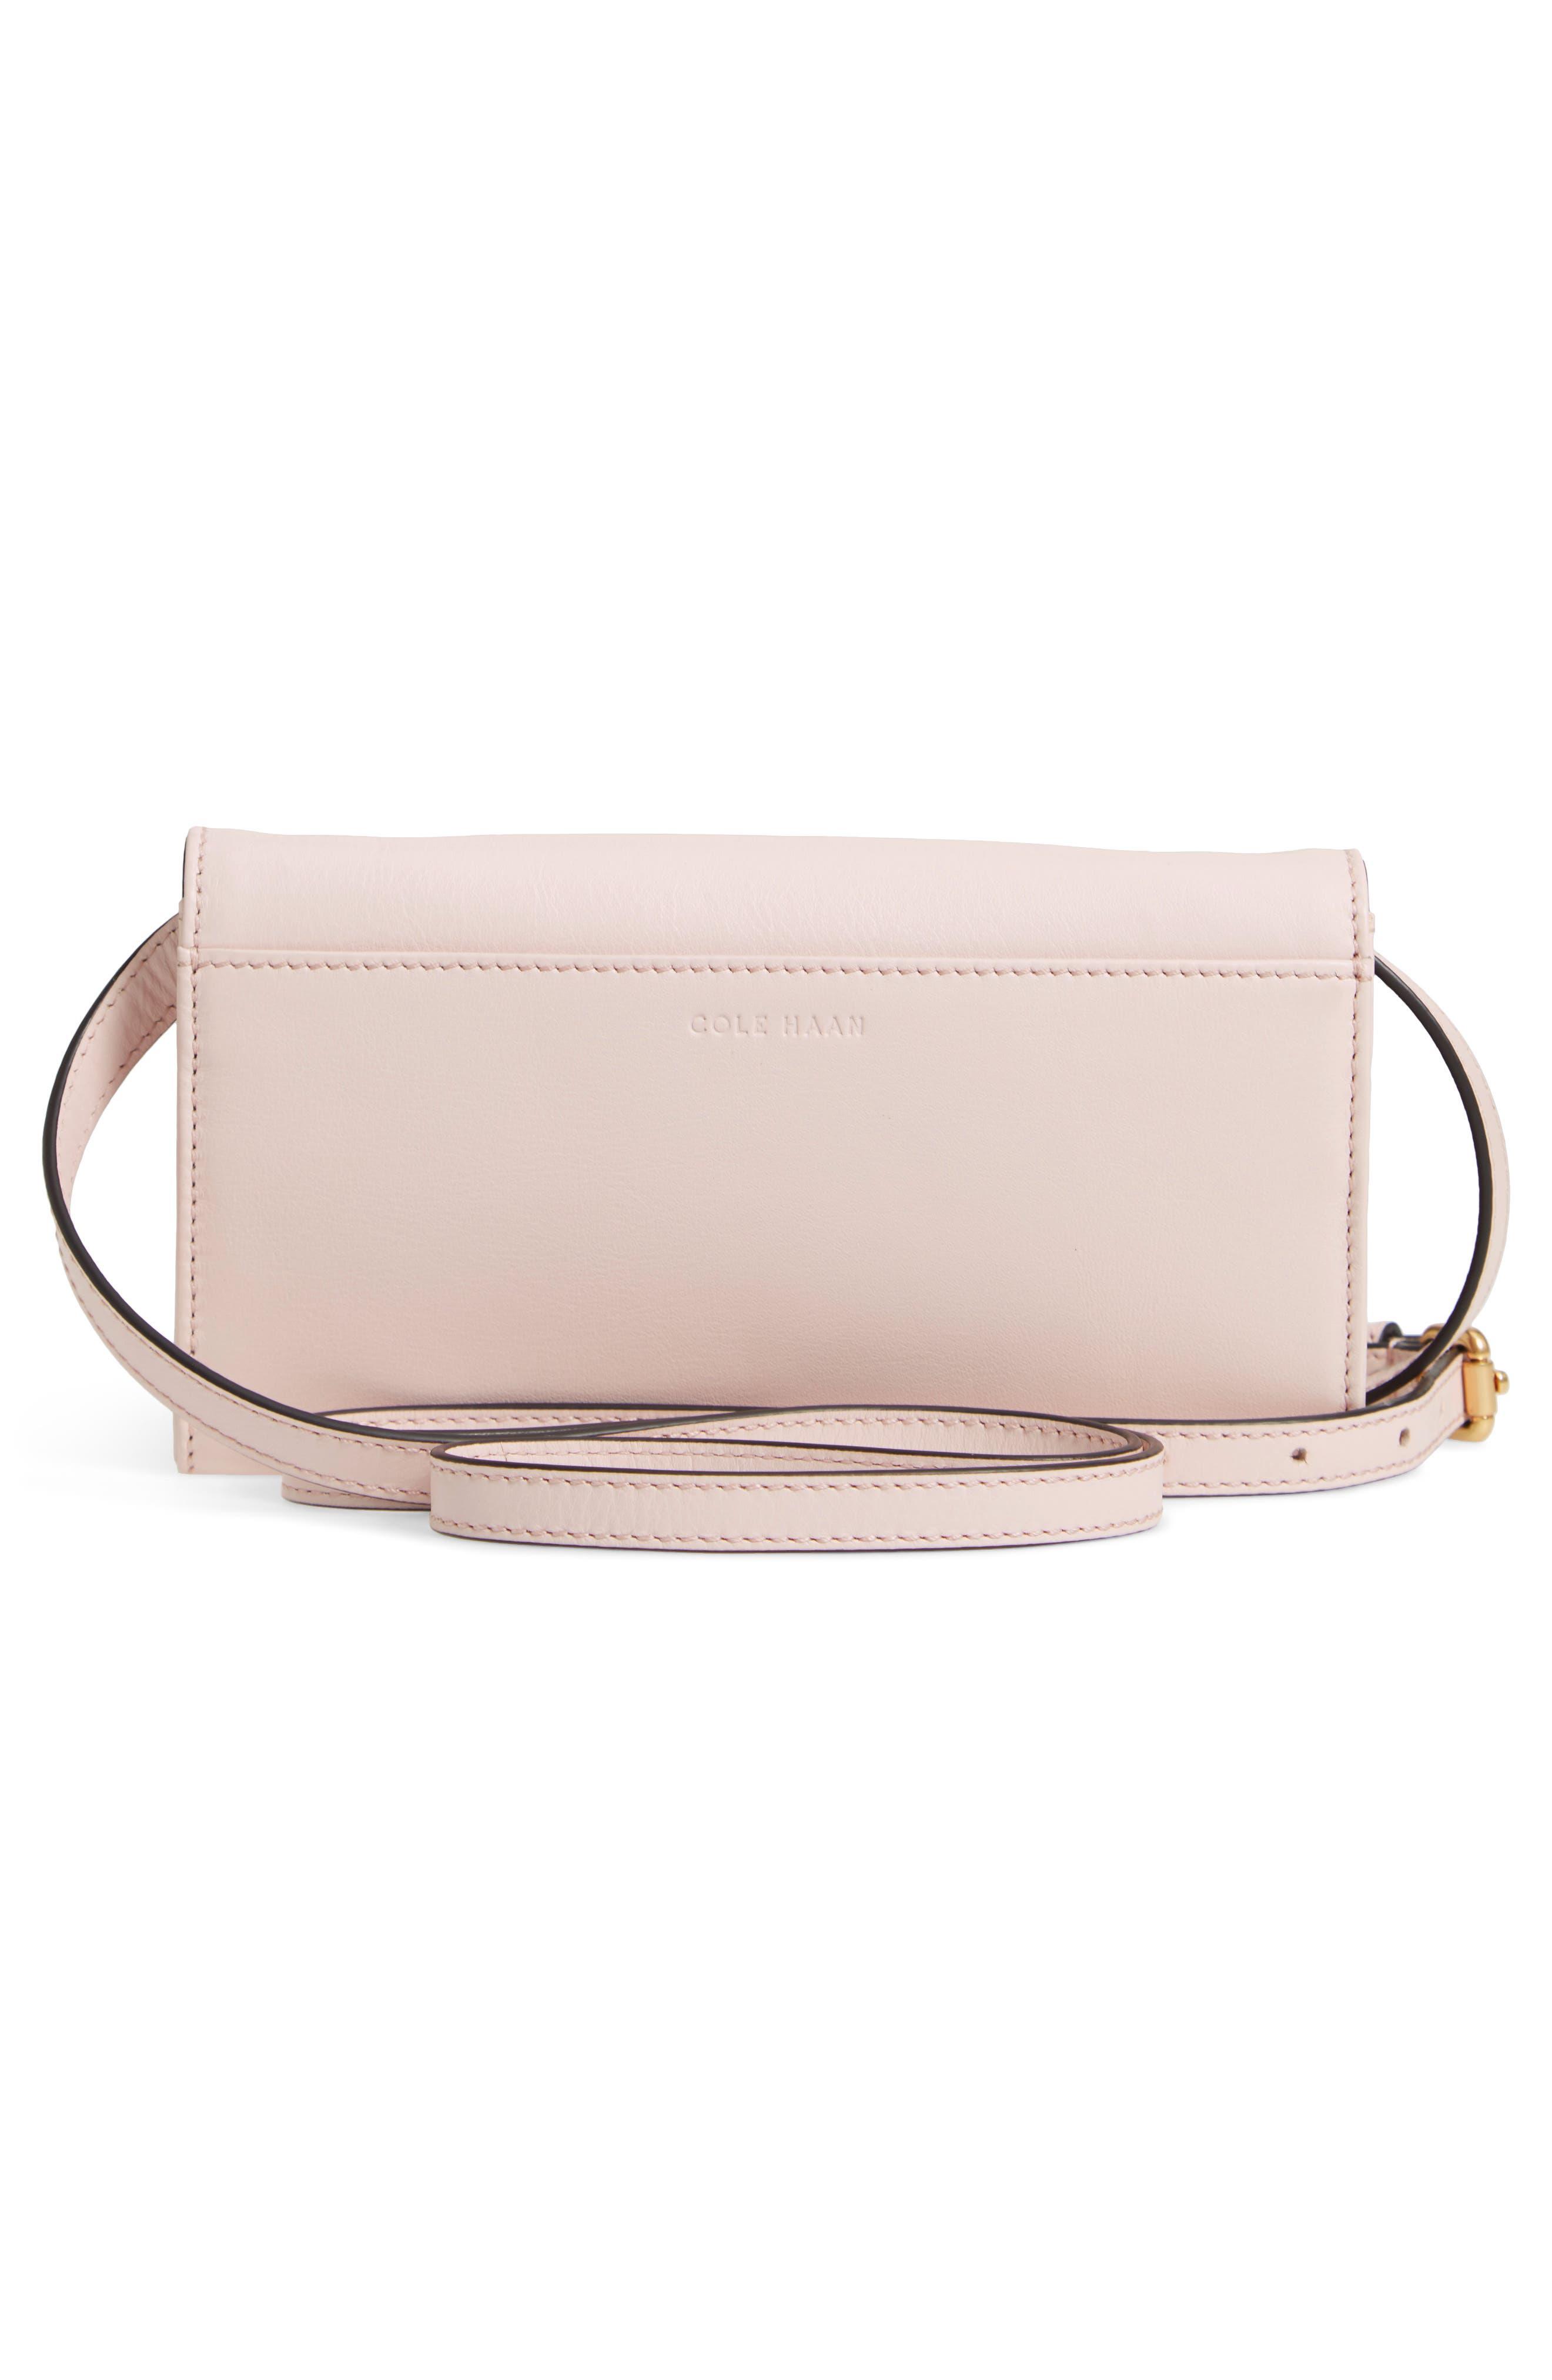 COLE HAAN,                             Zoe Leather Smartphone Crossbody Bag,                             Alternate thumbnail 3, color,                             650